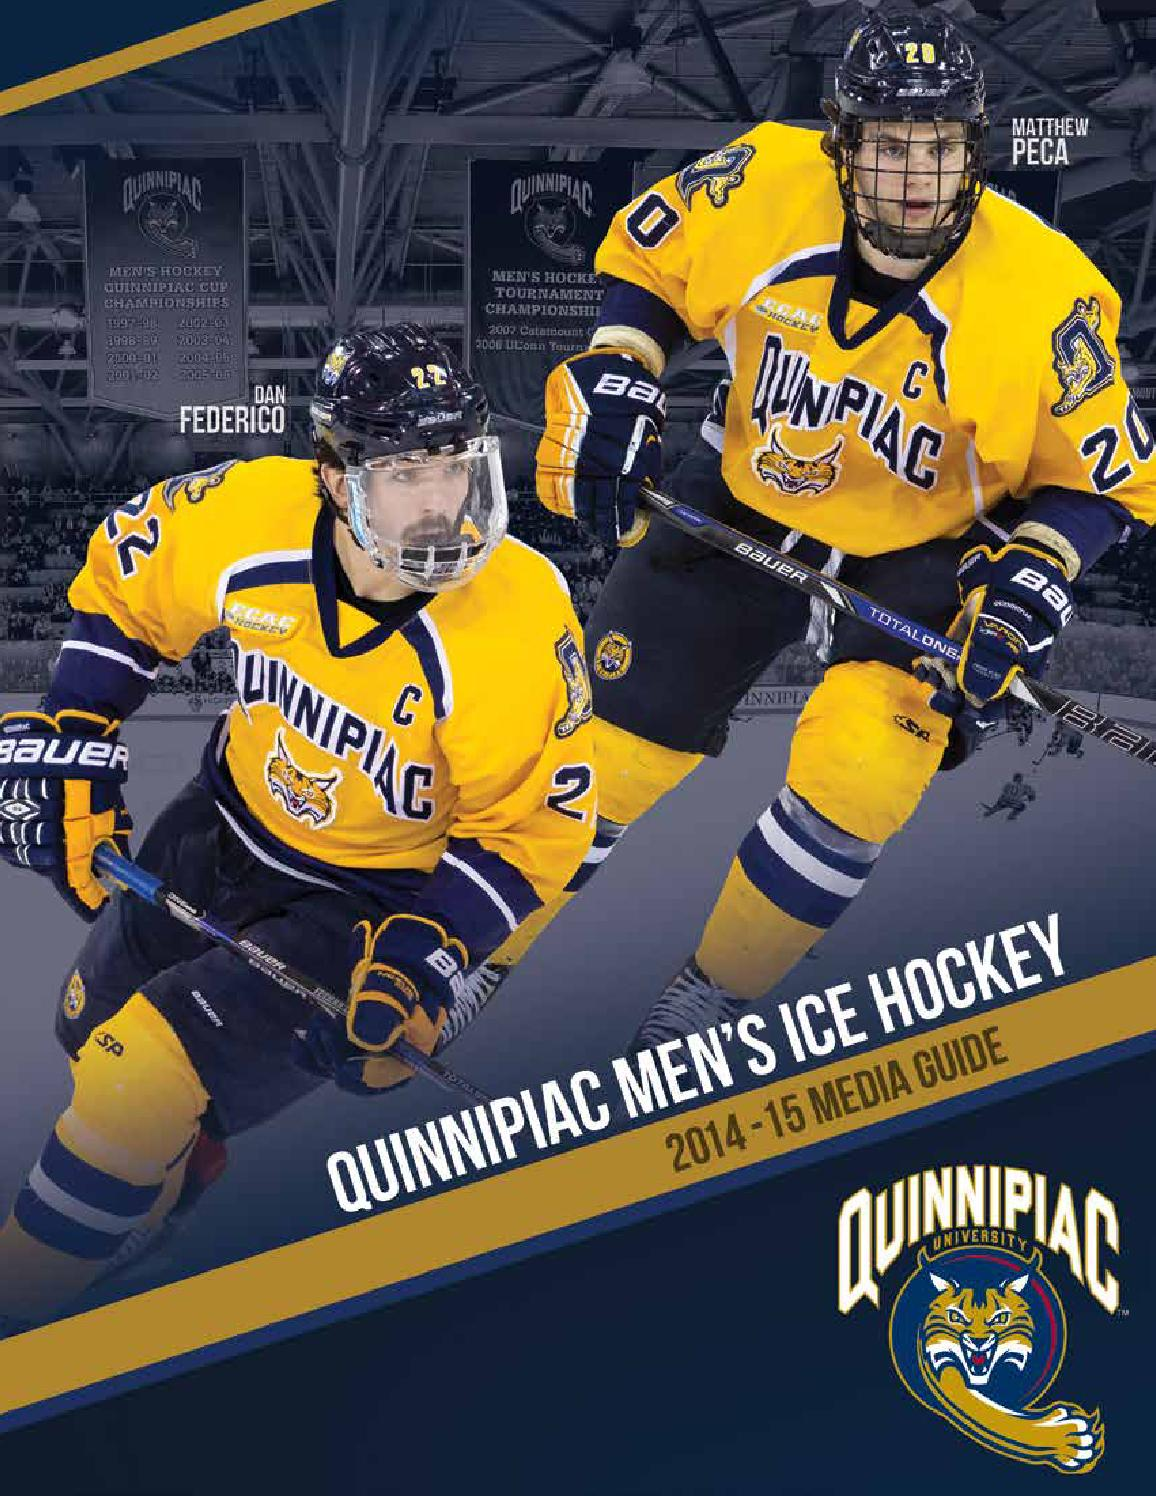 ISSUU - 2014-15 Quinnipiac Men's Ice Hockey Media Guide ...